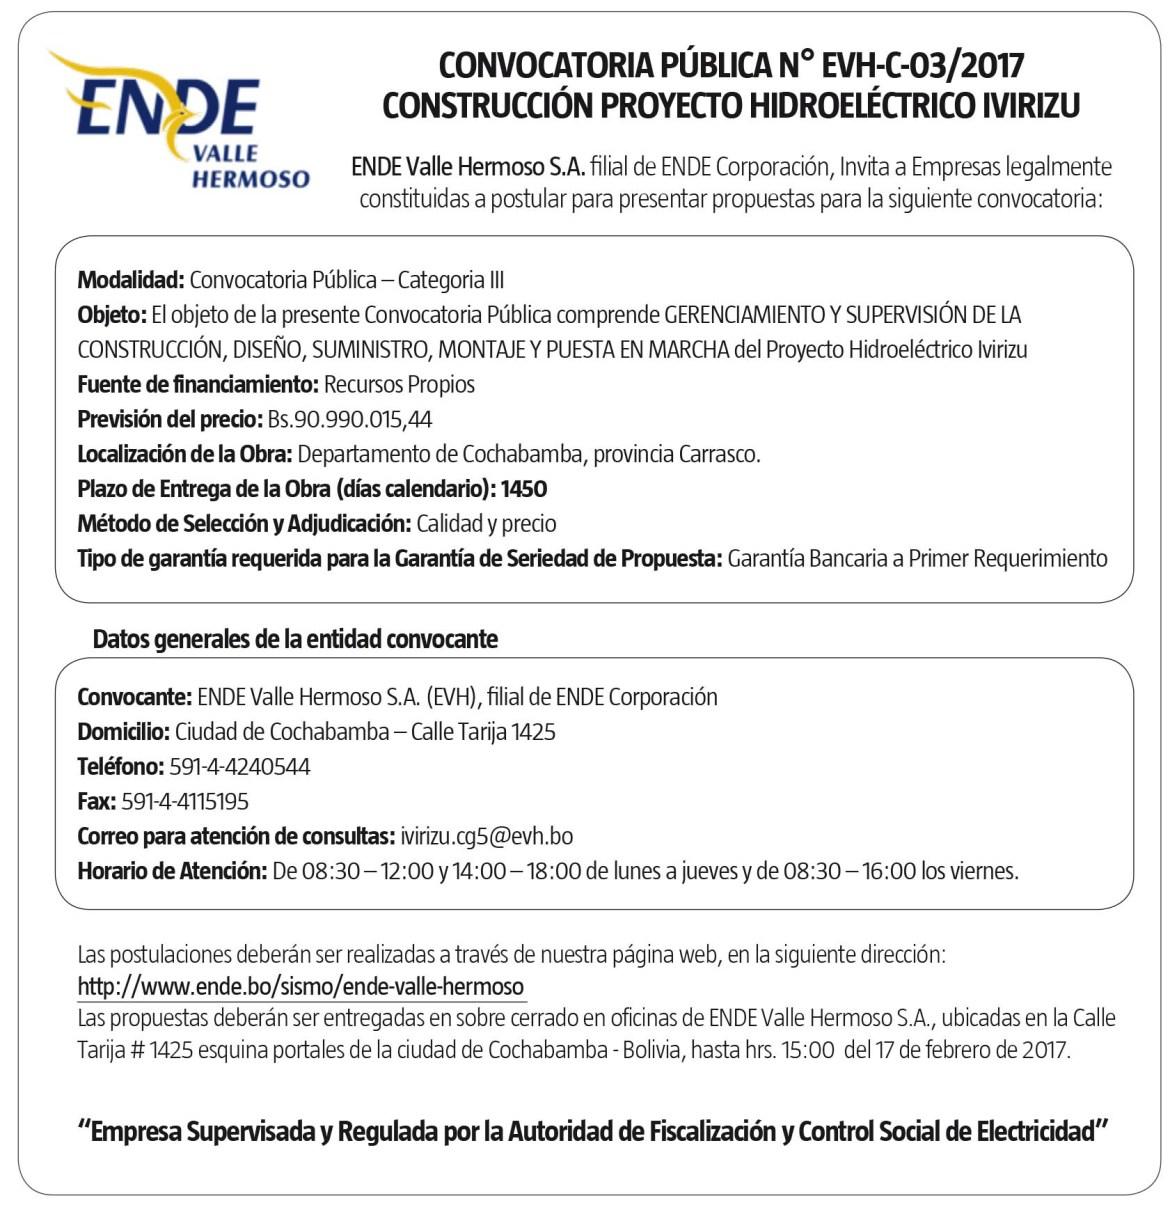 plantilla-ed-832-ende